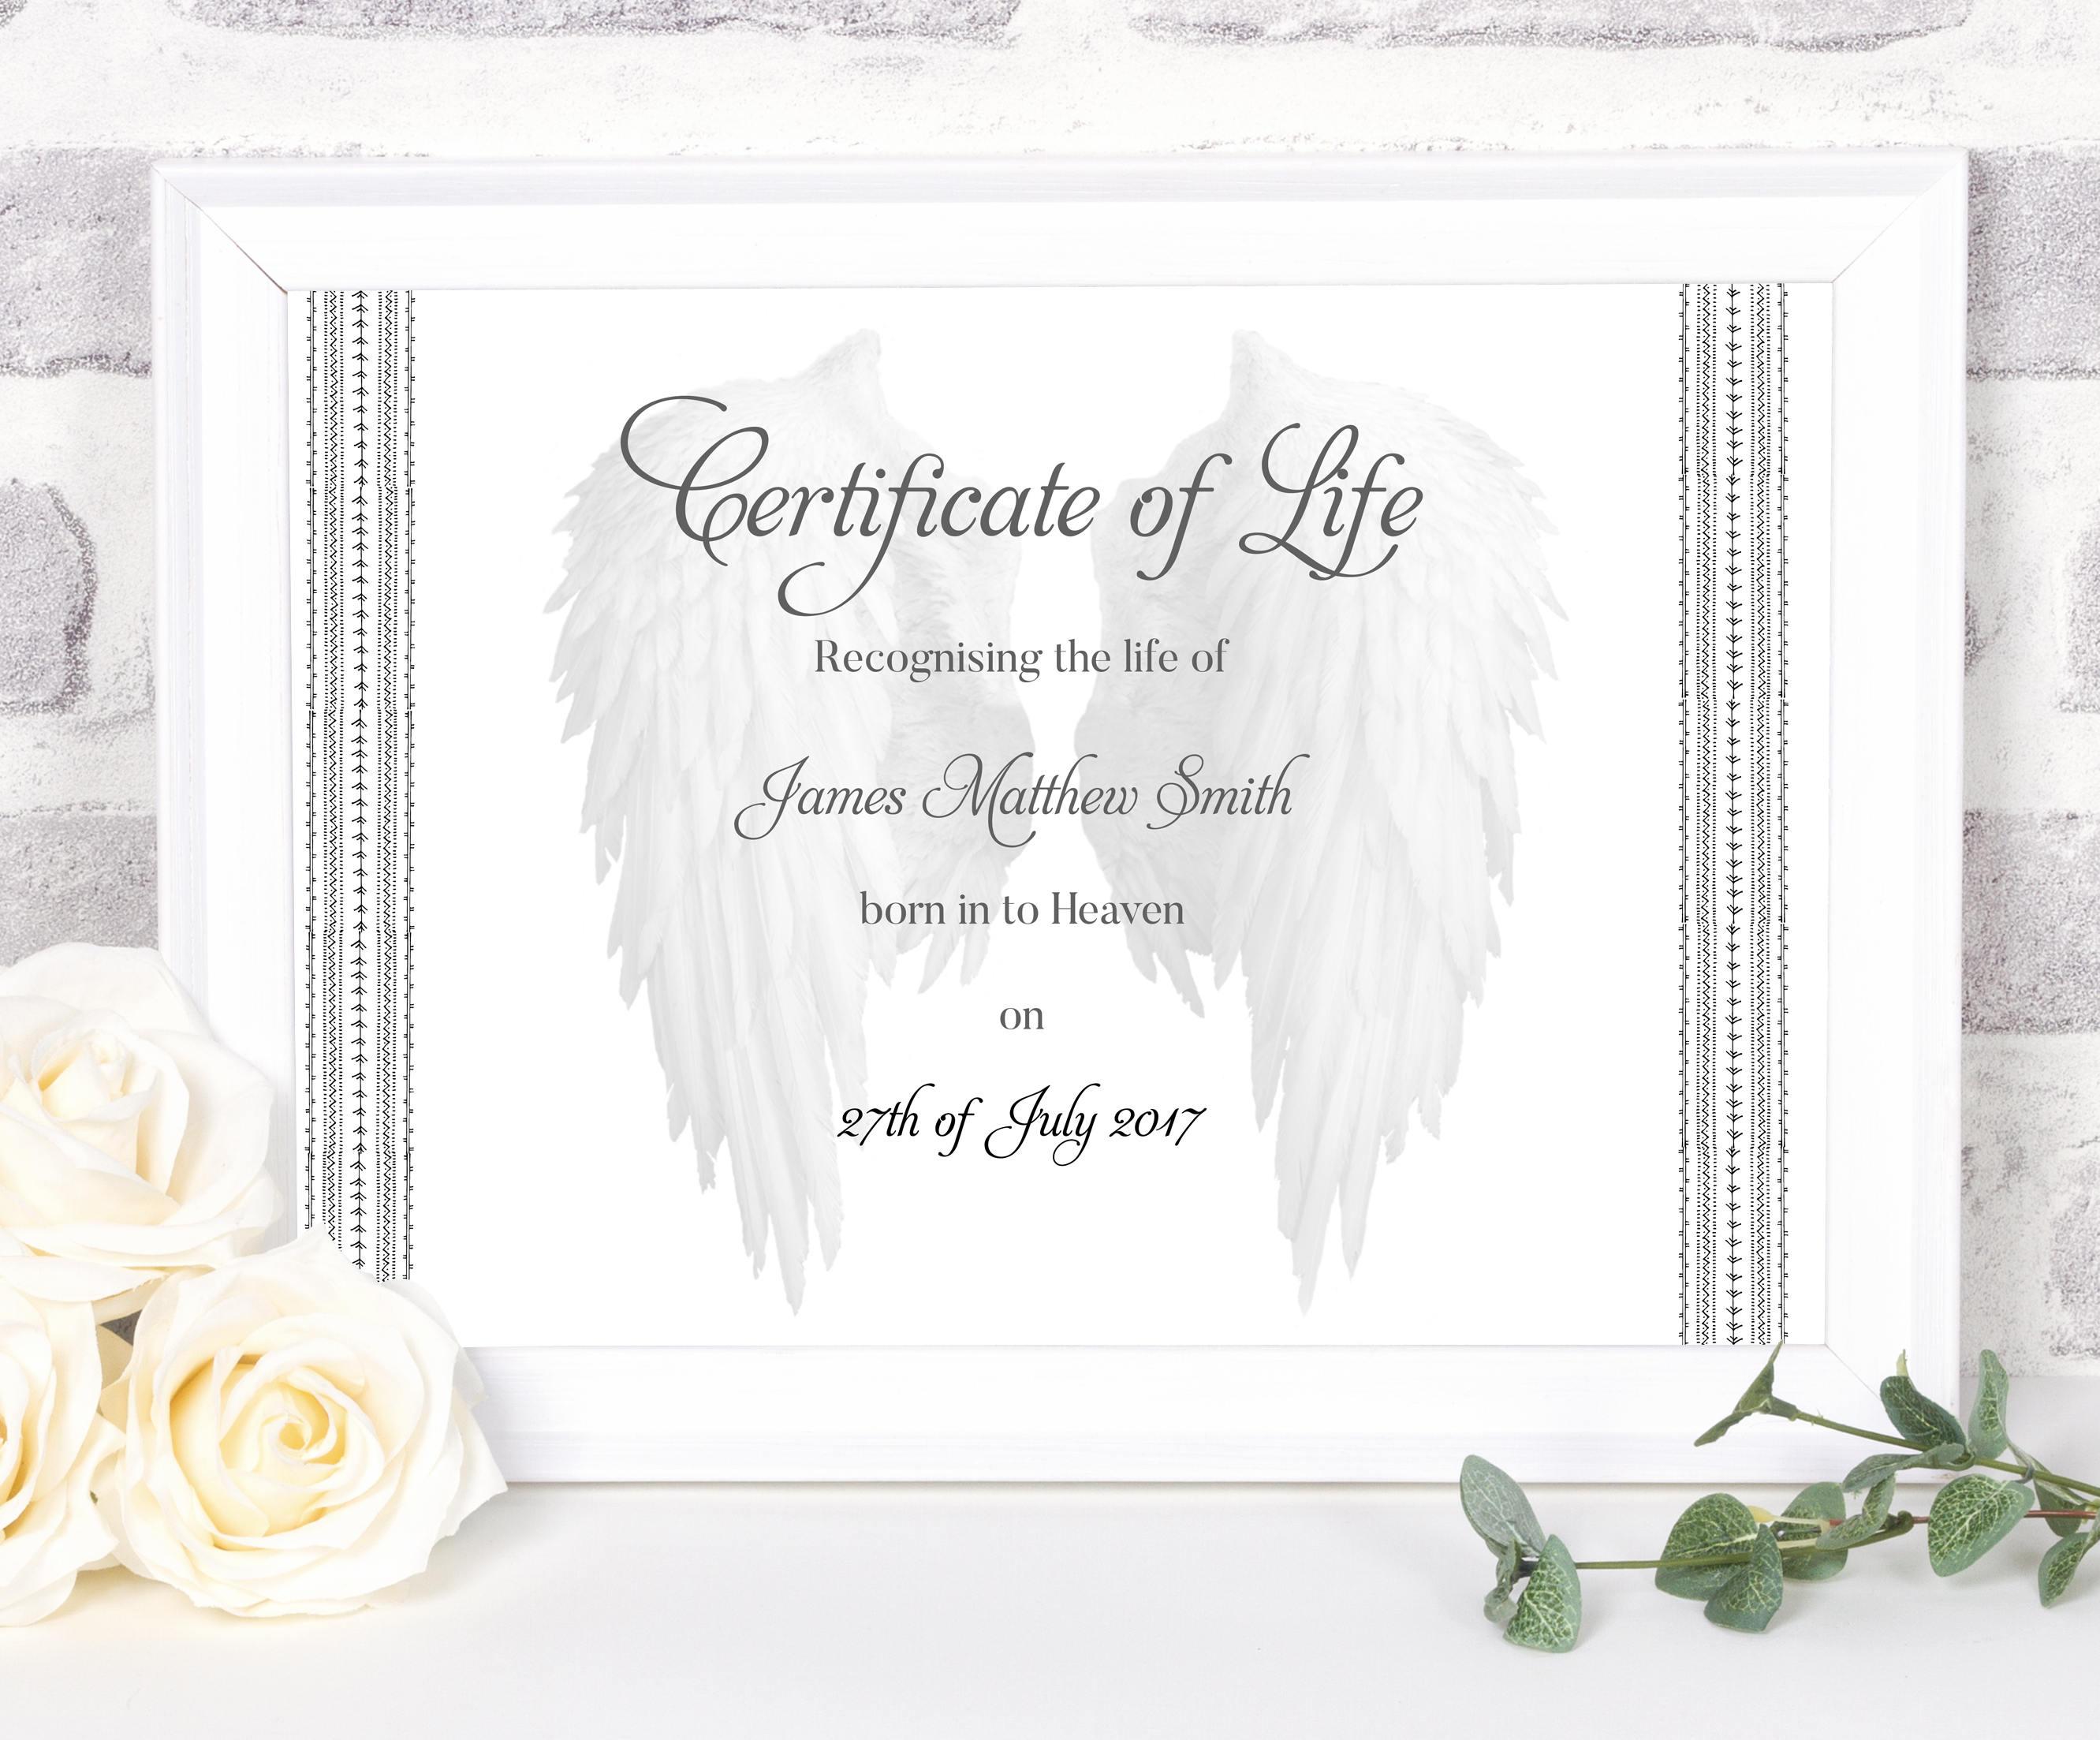 Certificate of life stillbirth memorial stillborn memorial description certificate aiddatafo Choice Image